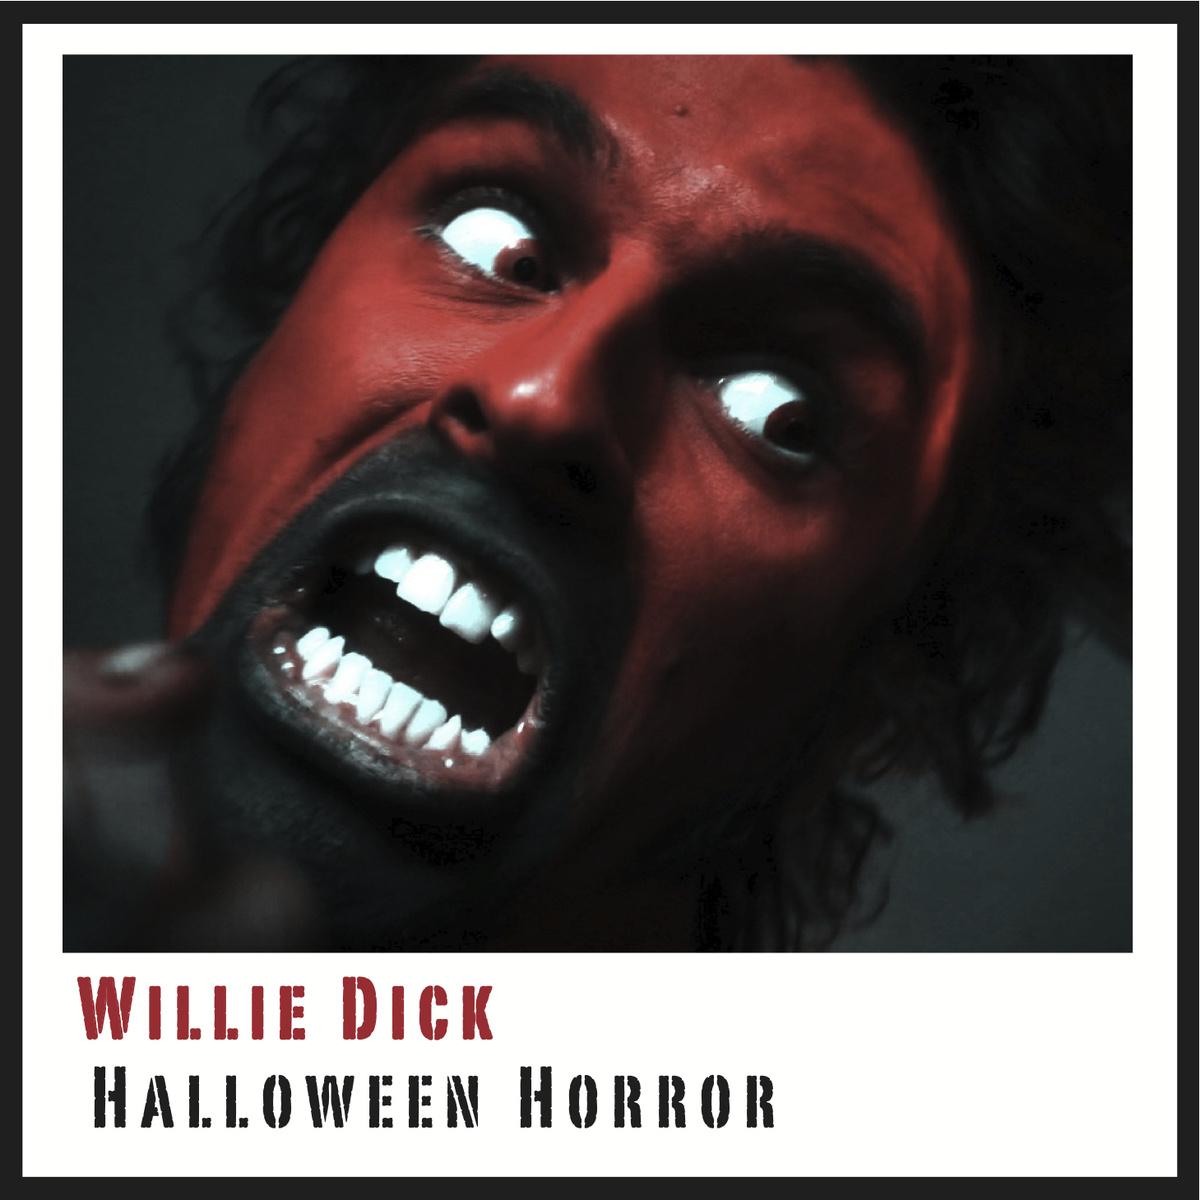 williedick